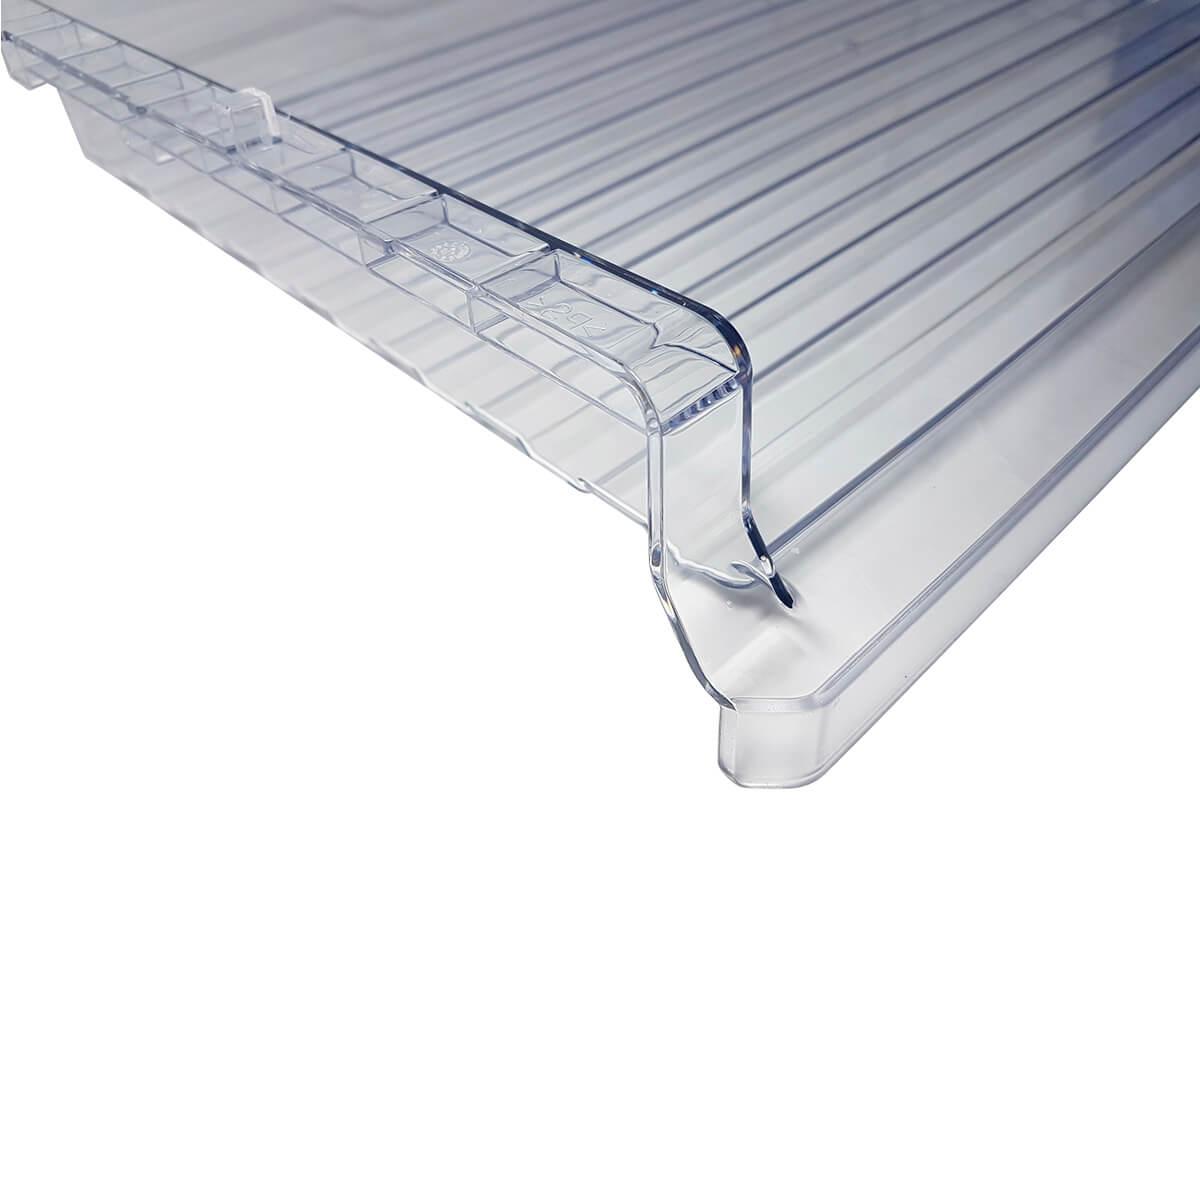 Bandeja Chill Room Para Refrigerador Electrolux IF55 IF55S TF55 TF55S - A13462001